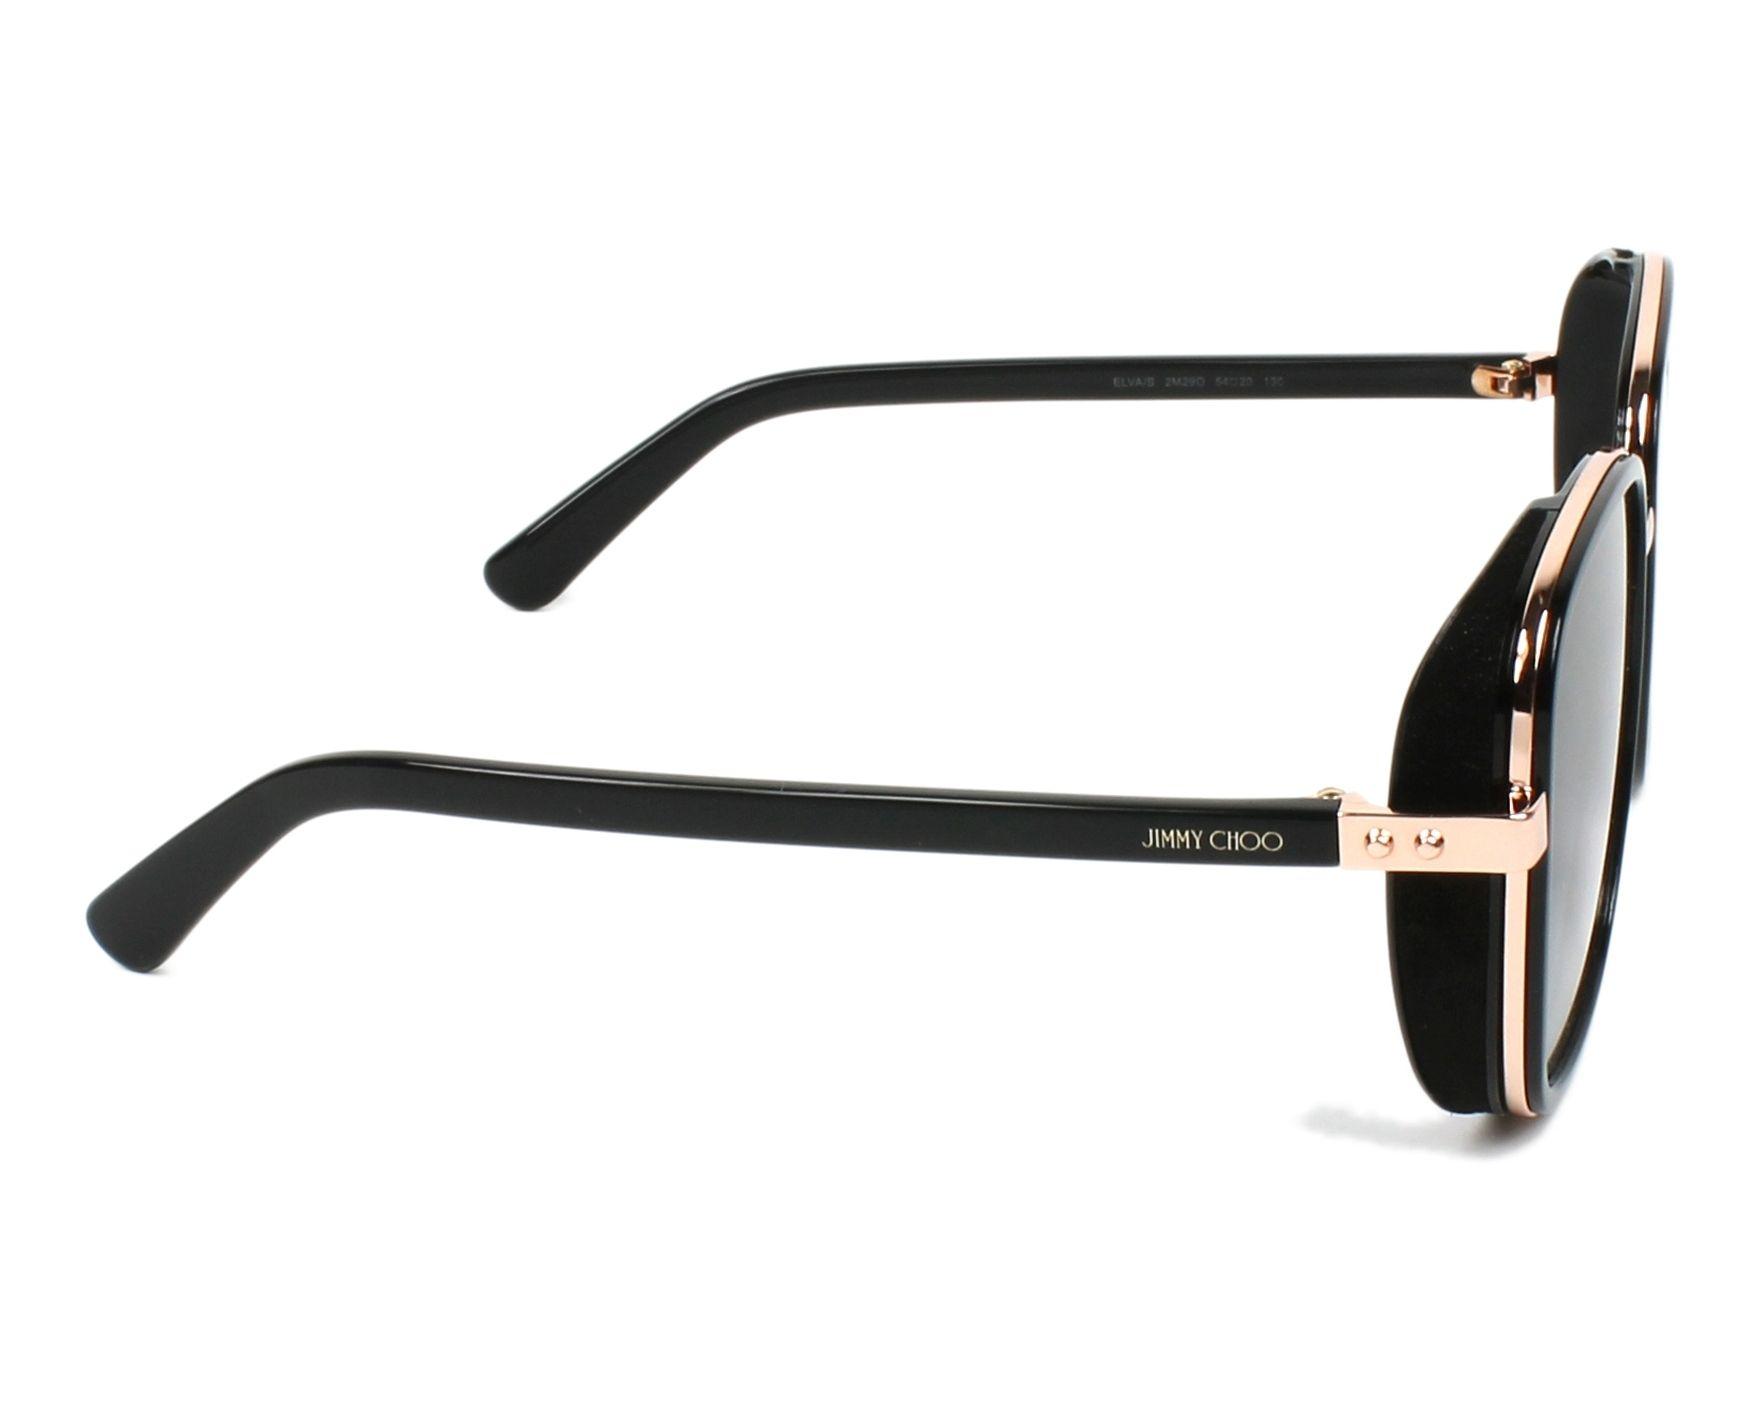 7615959f744e Sunglasses Jimmy Choo ELVA-S 2M2 90 54-20 Black Gold Copper side